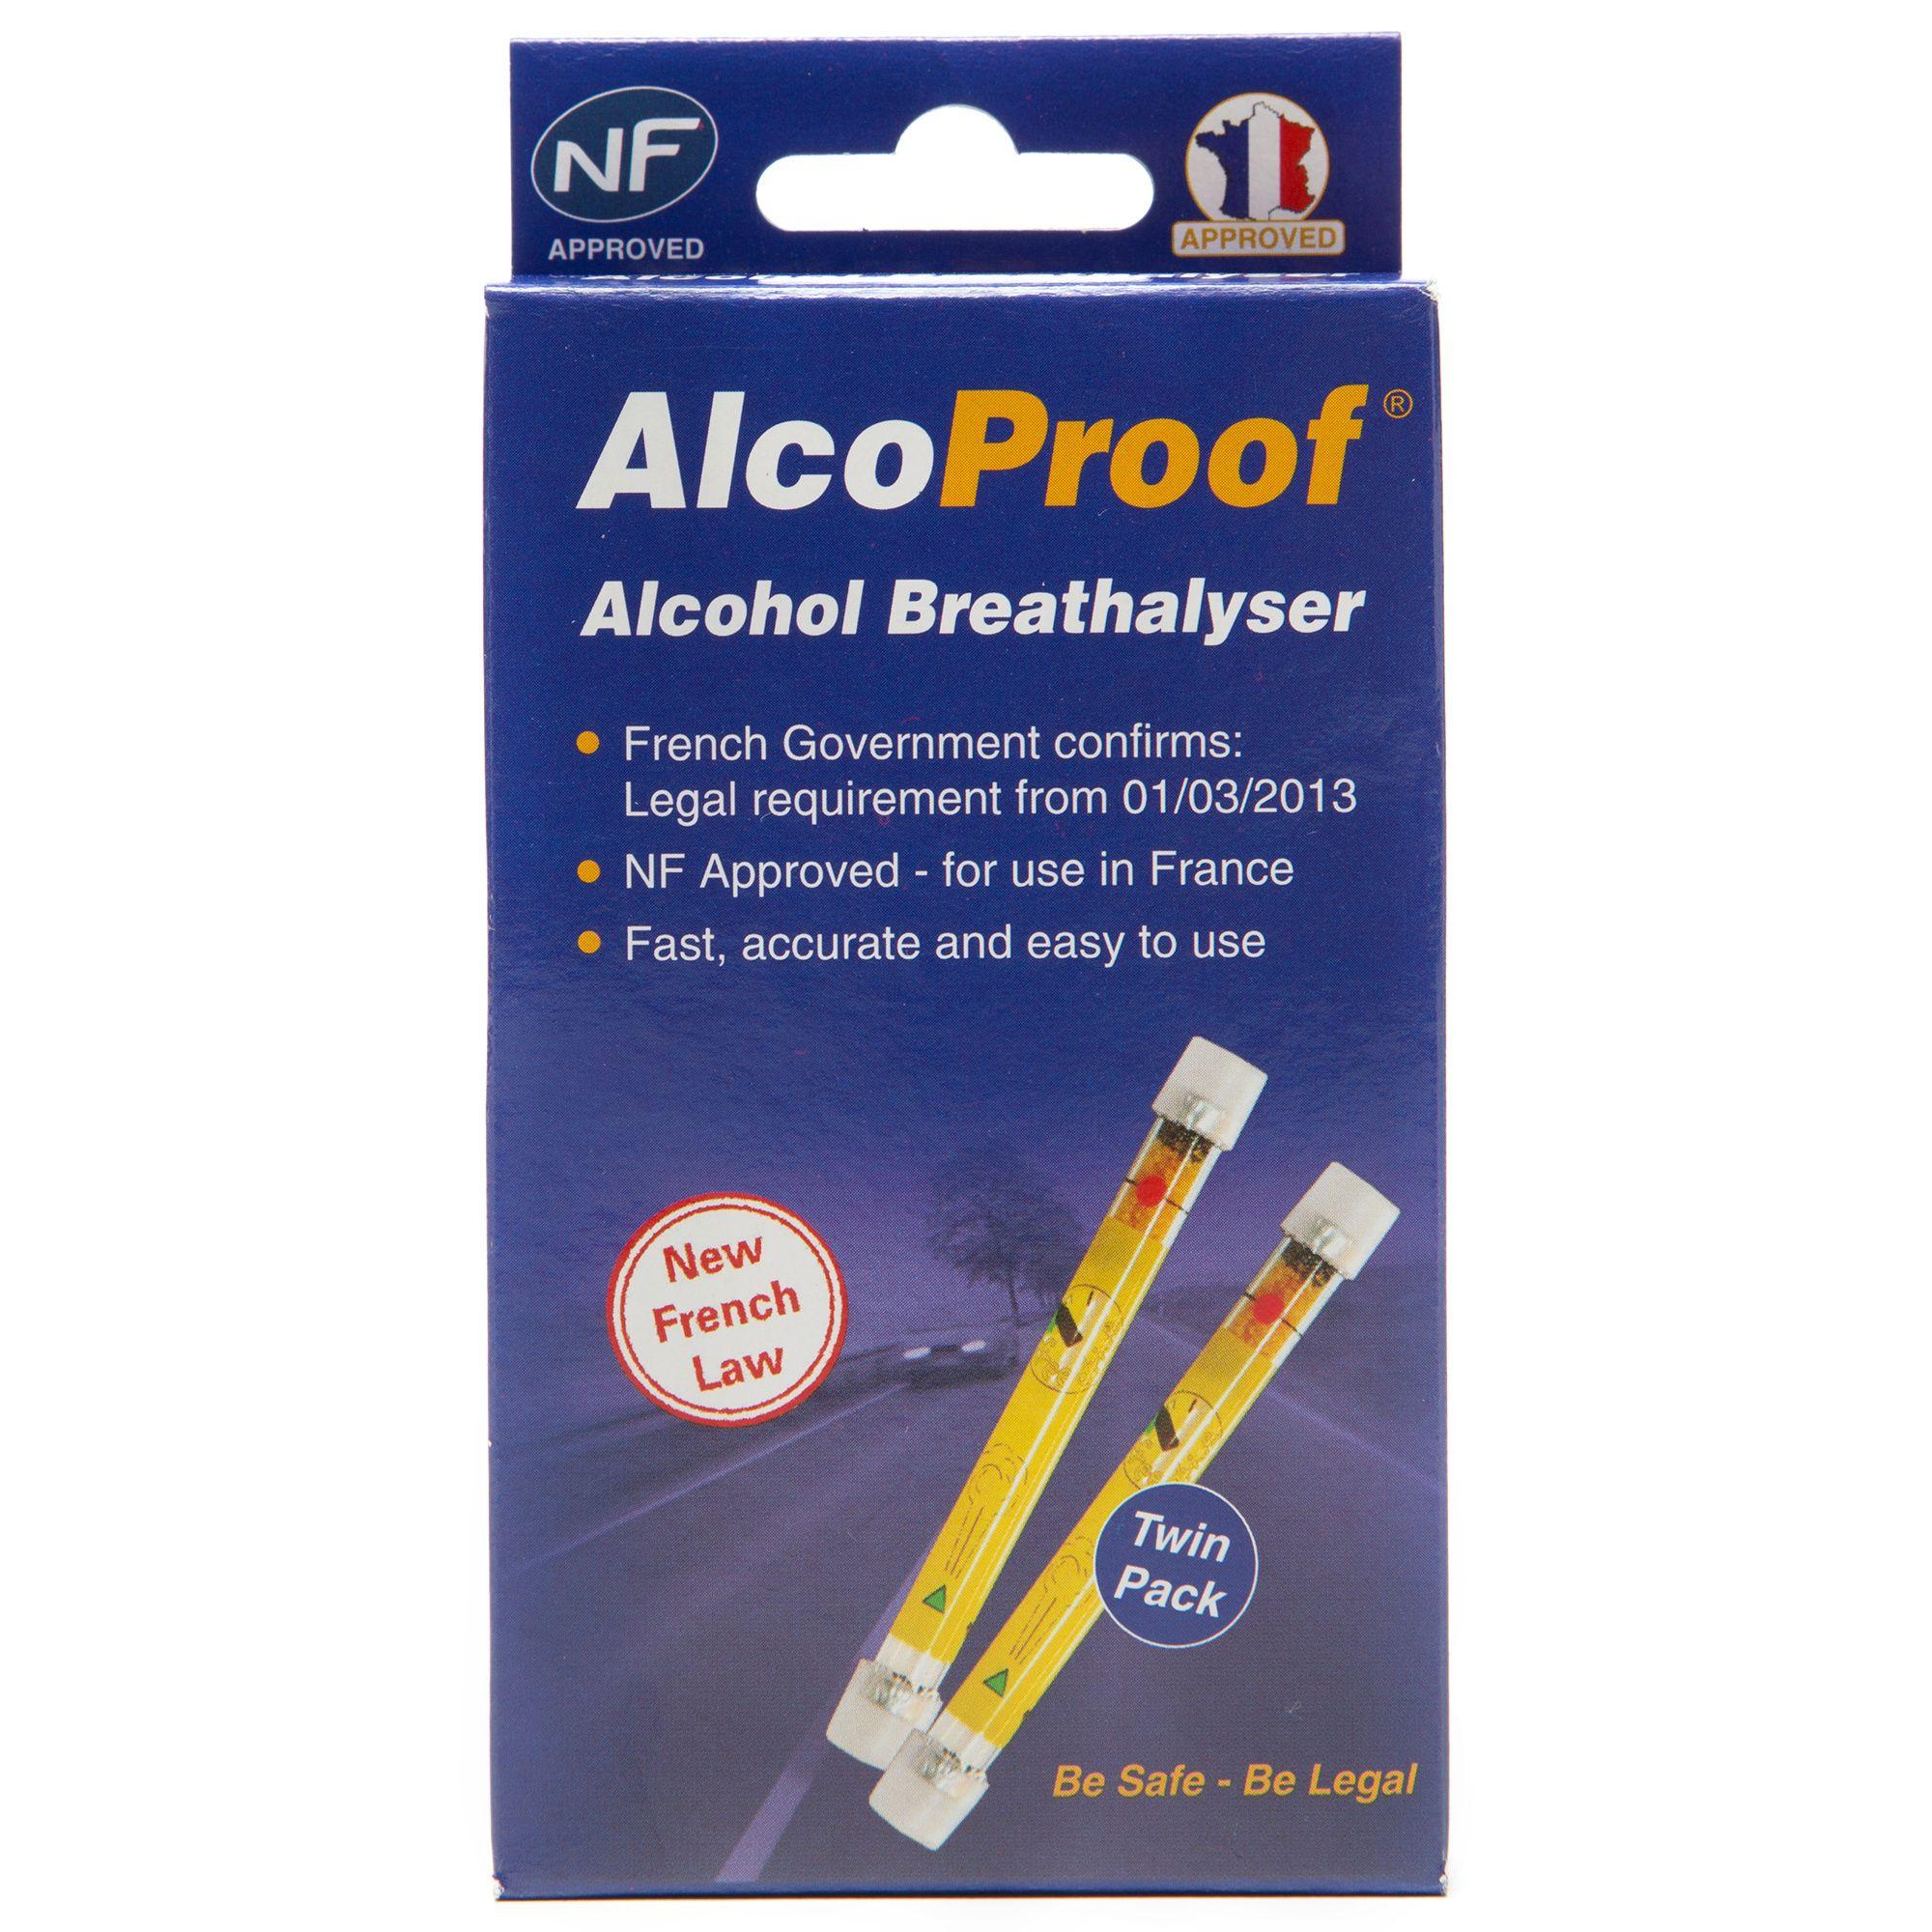 BOYZ TOYS Alcoproof Alcohol Breathalyser